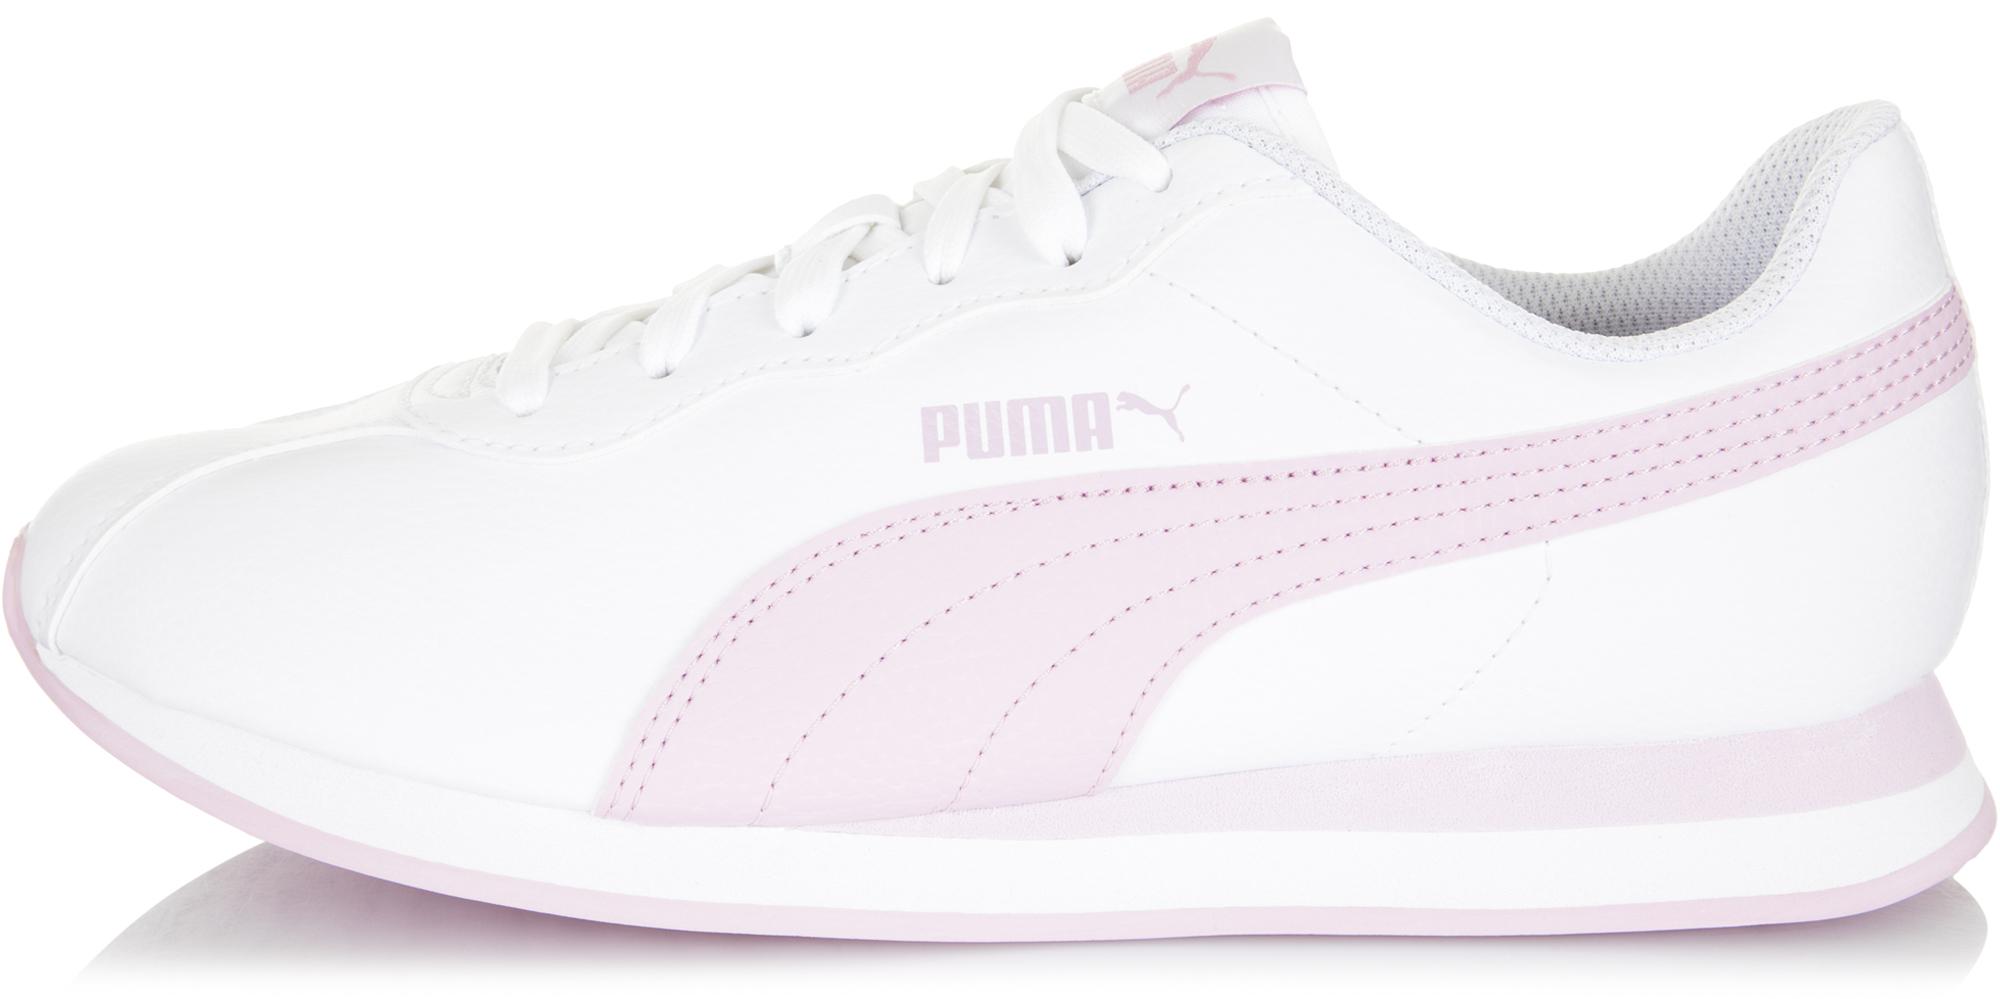 Puma Кроссовки женские Puma Turin II, размер 40